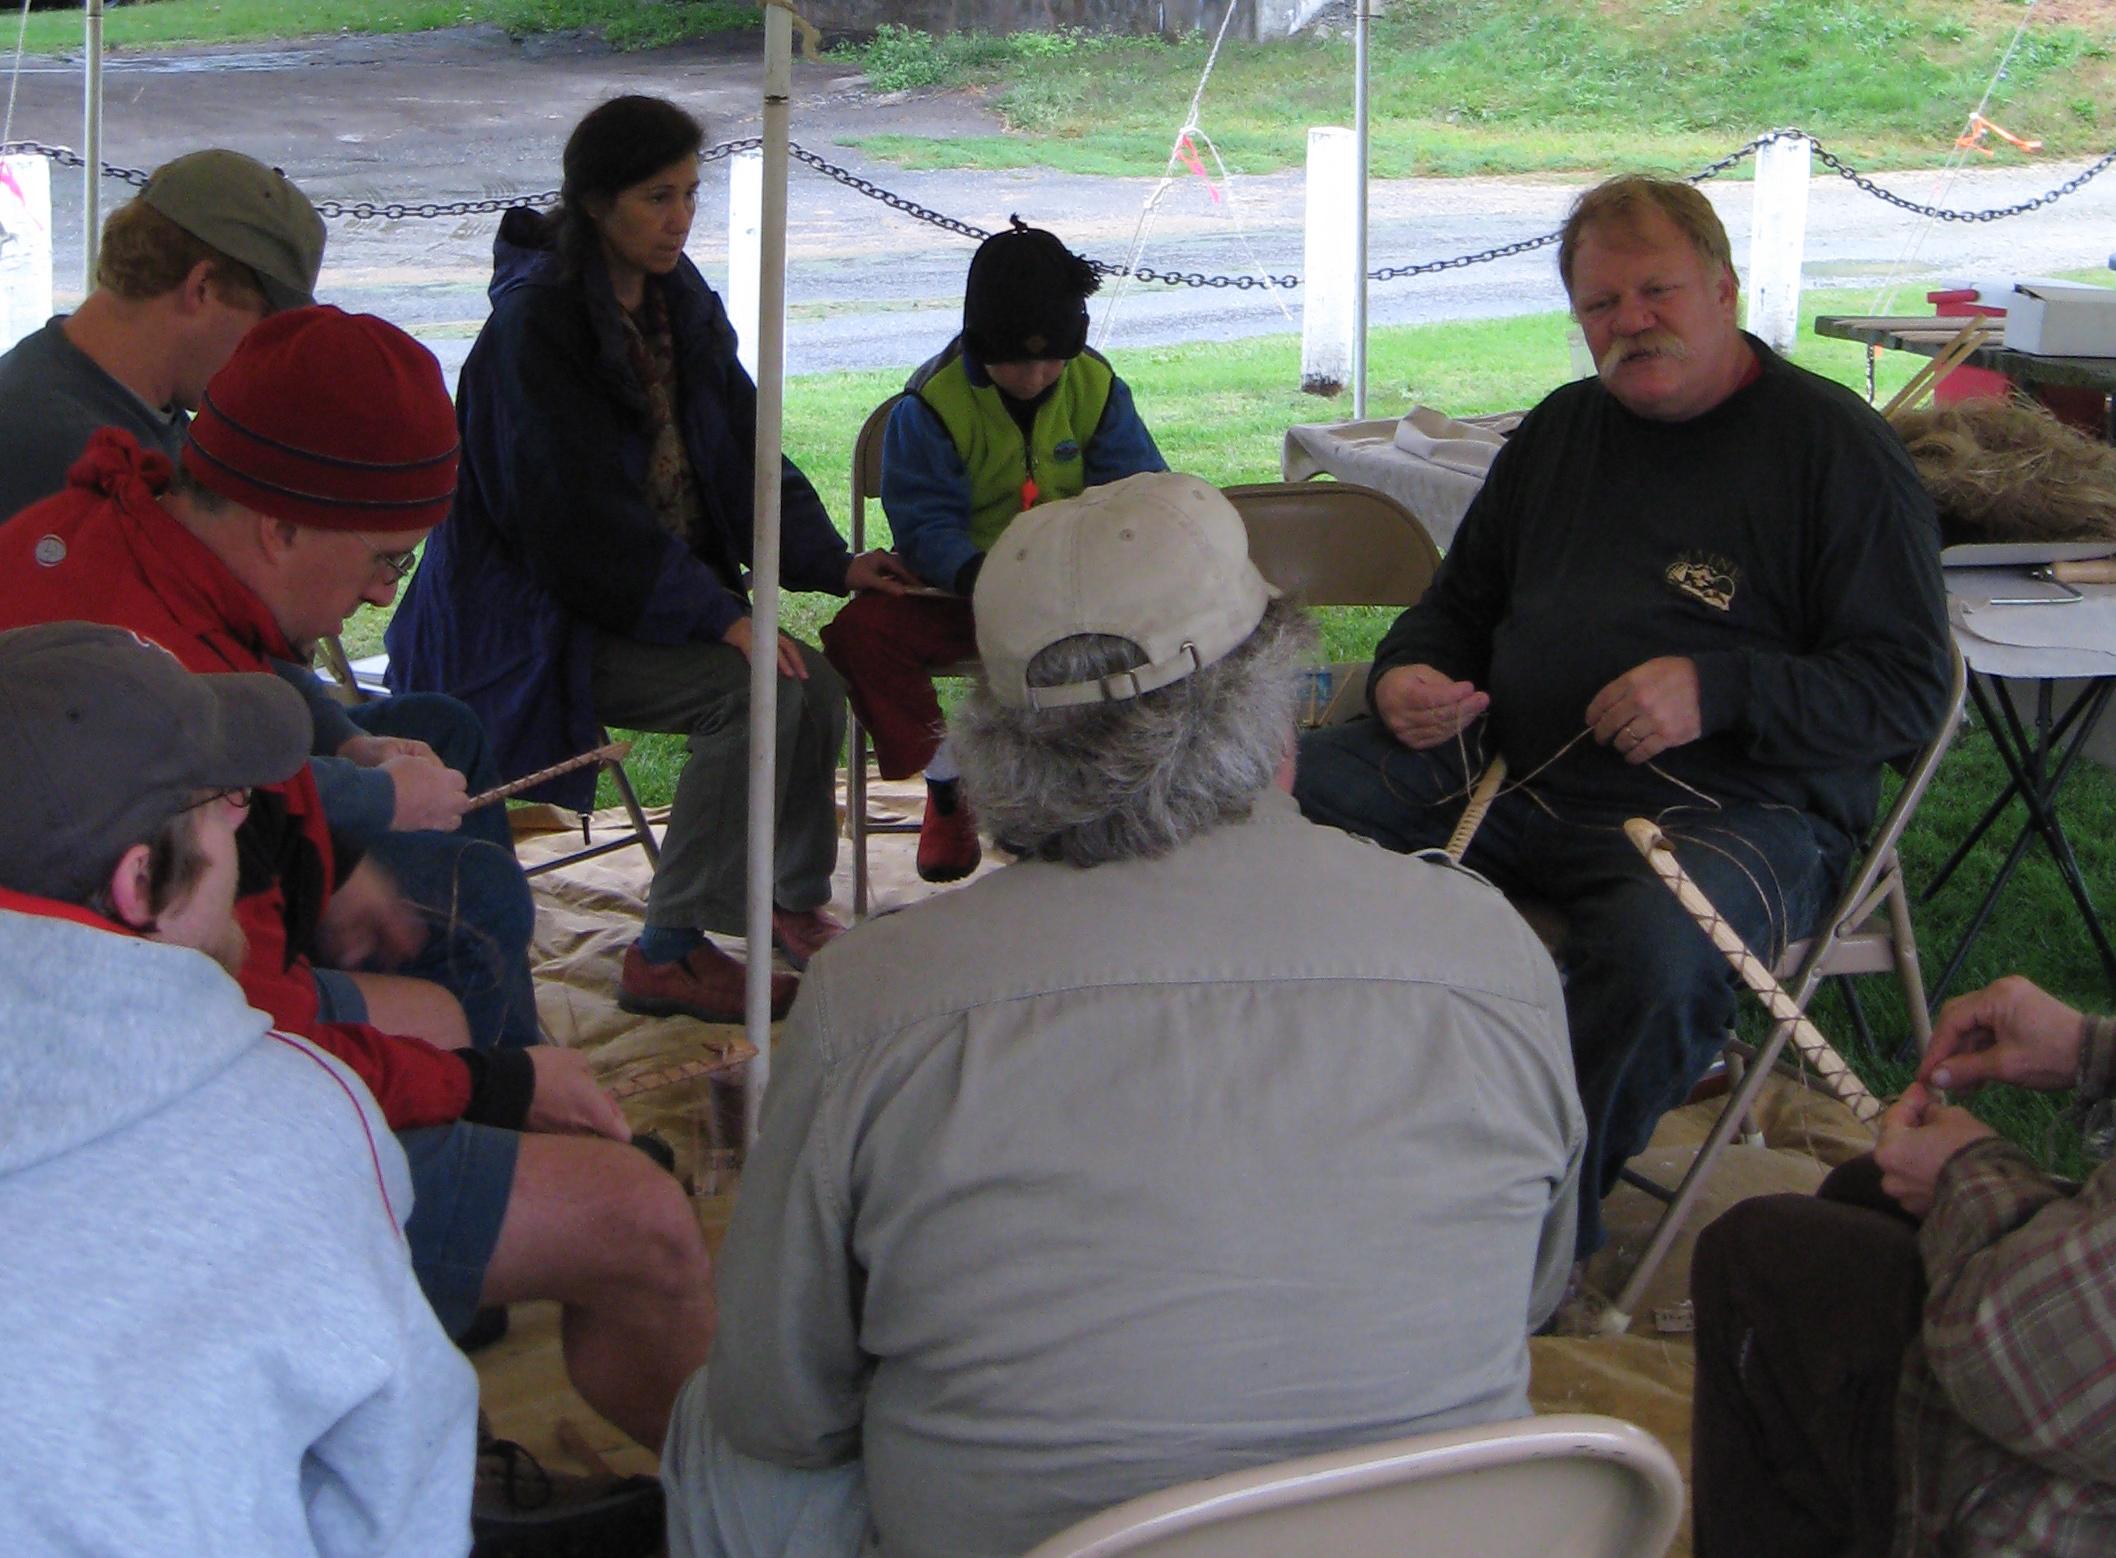 Bob Berg leads an atlatl workshop in Vermont